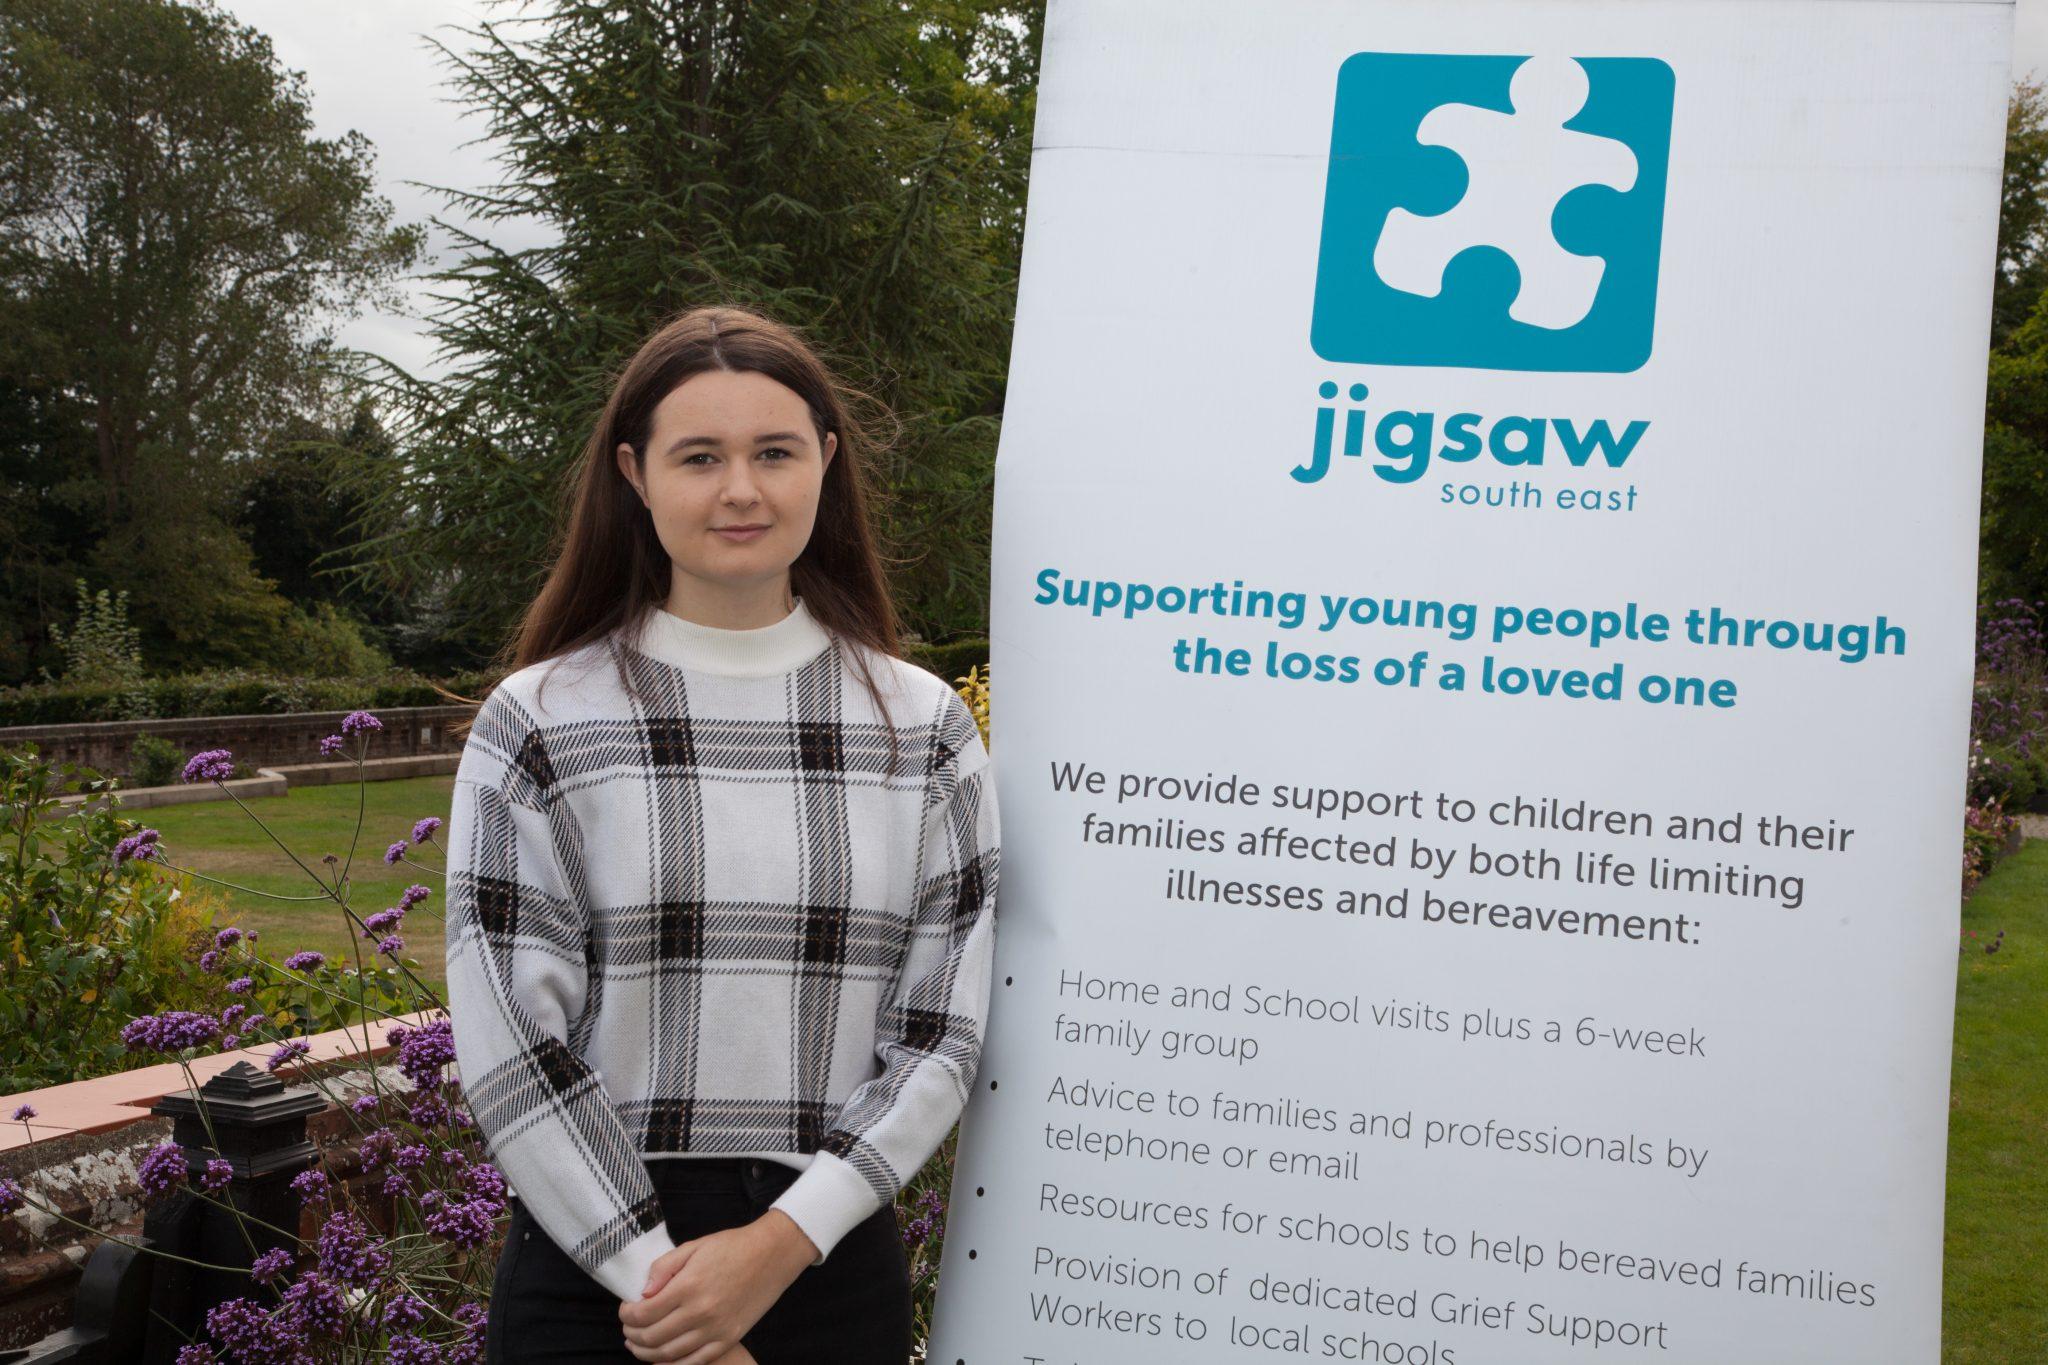 Celebrating Jigsaw (South East) Volunteers – Meet Young Ambassador Molly Humphreys